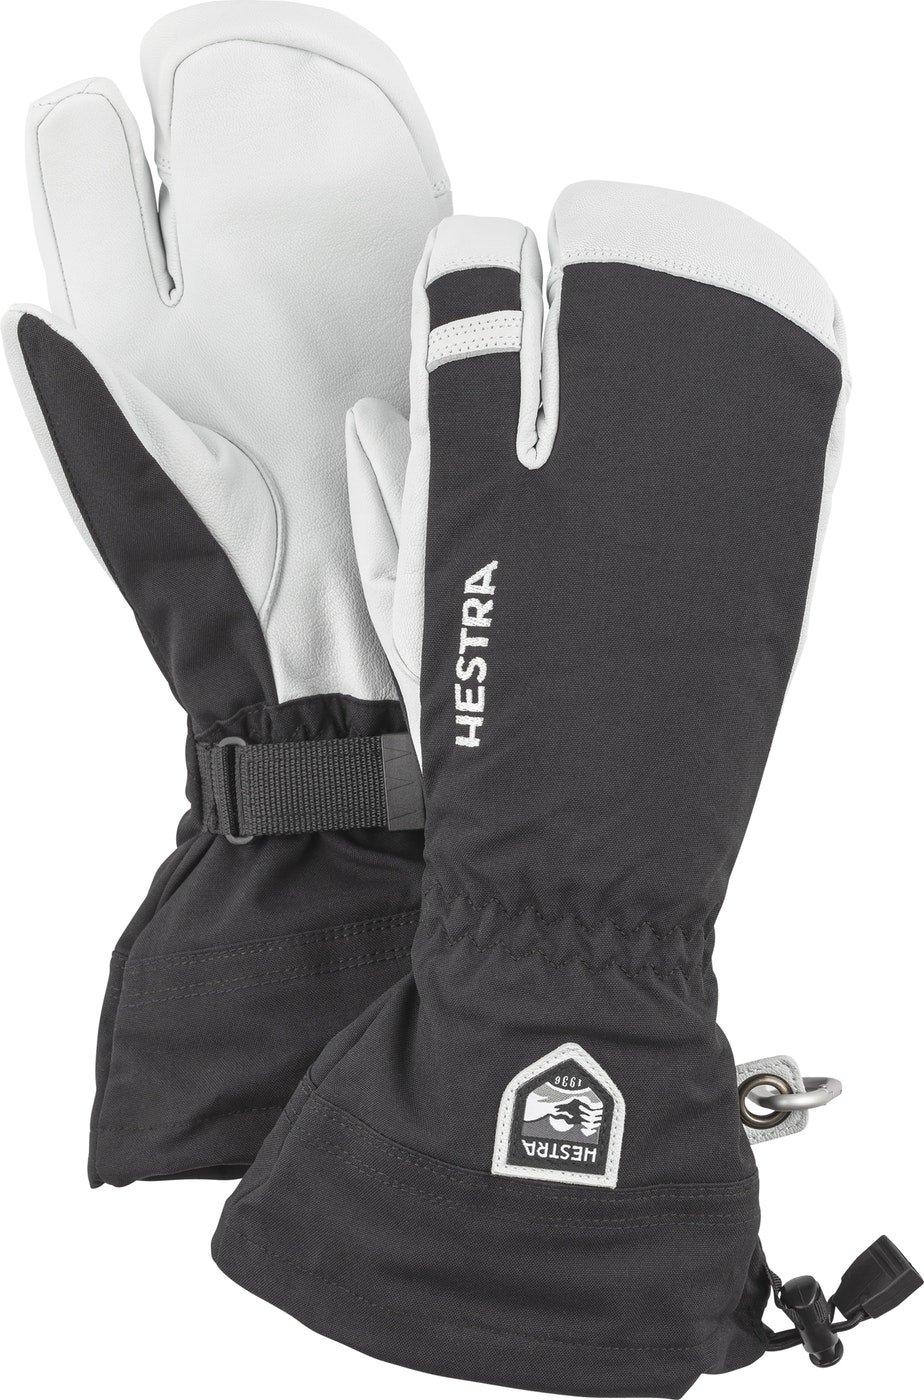 Hestra Army Leather Heli 3-Finger Ski Gloves - Black